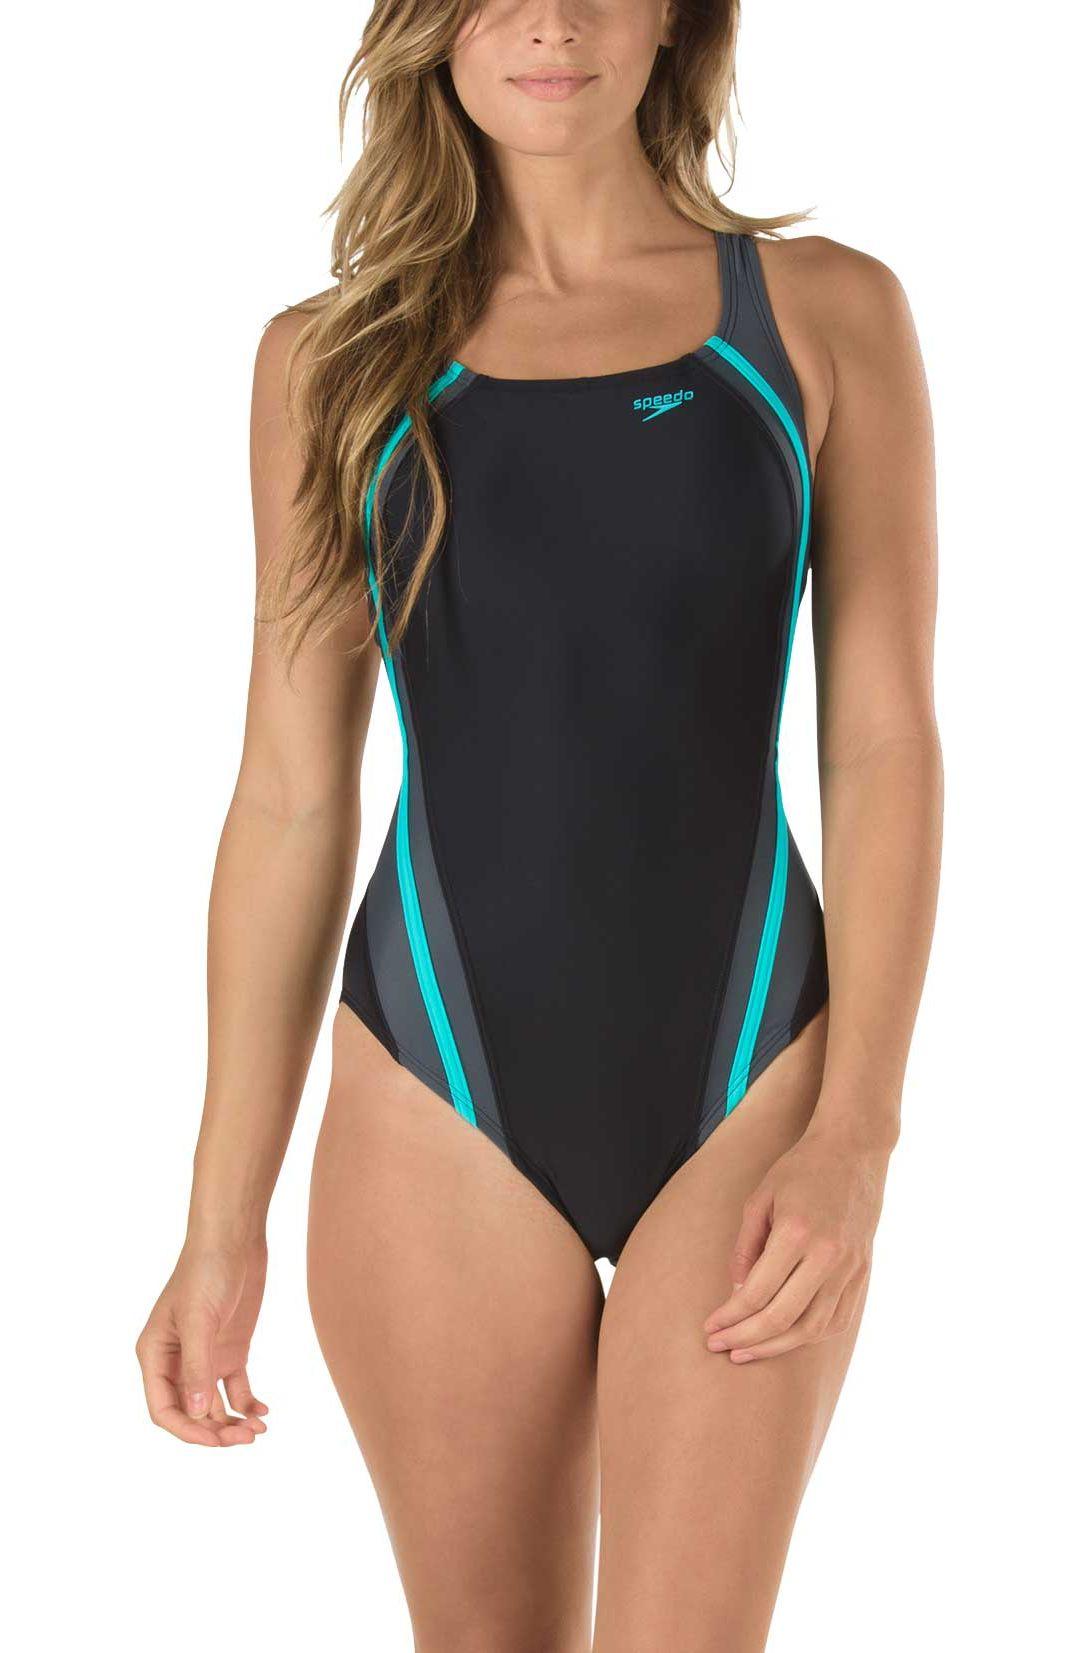 bac94ae250b5b Speedo Women's Quantum Splice Swimsuit | DICK'S Sporting Goods